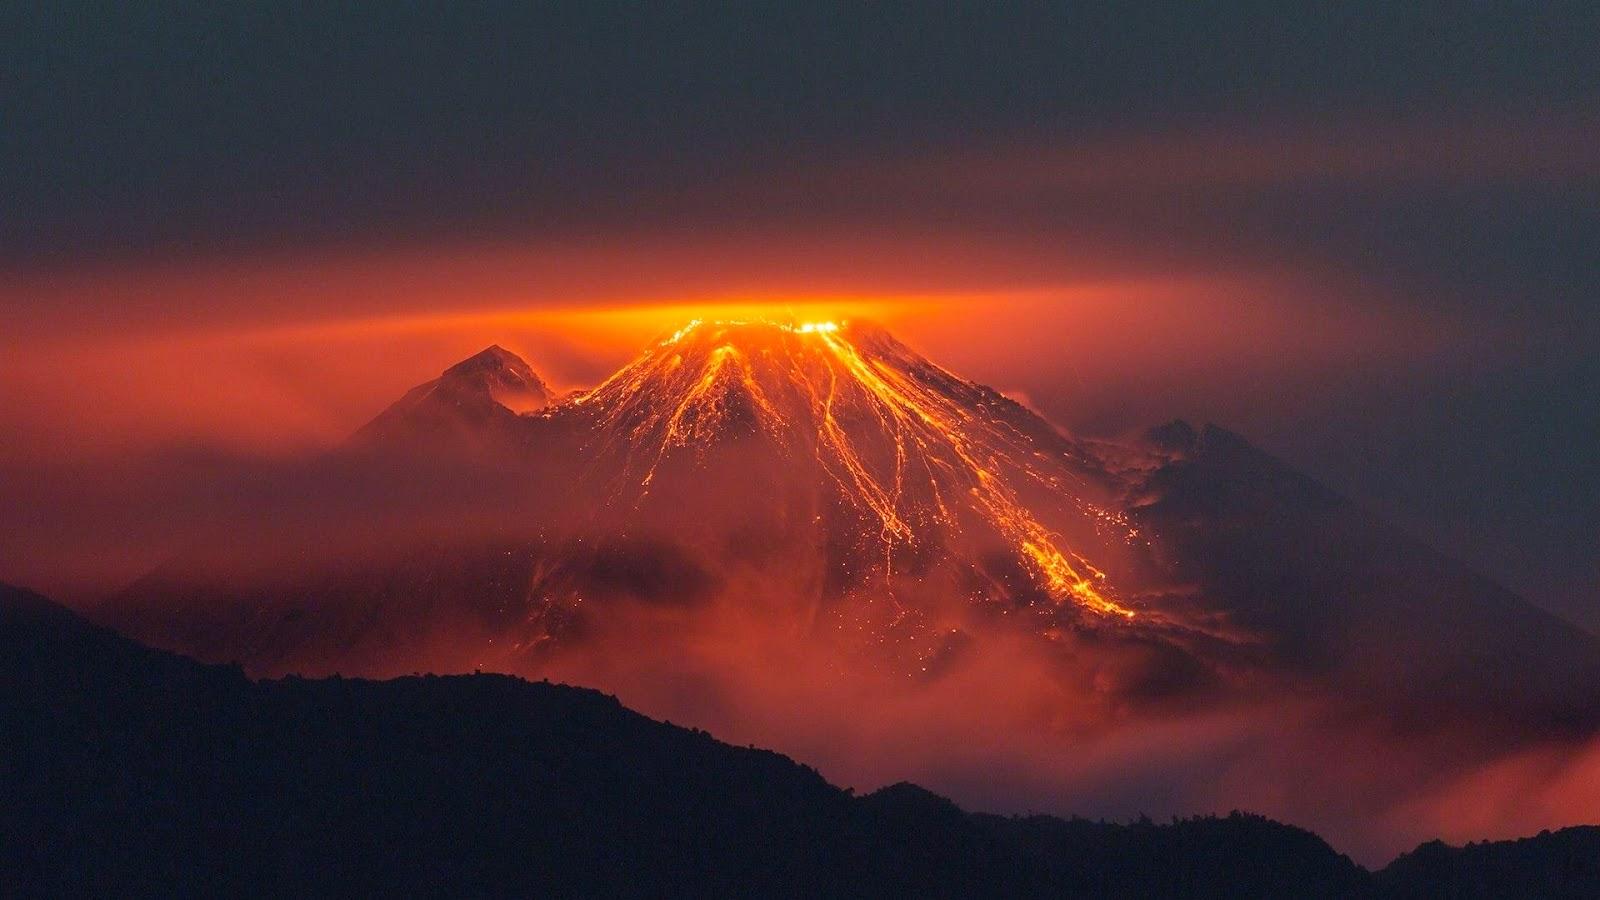 Gunung Meletus / Volcano